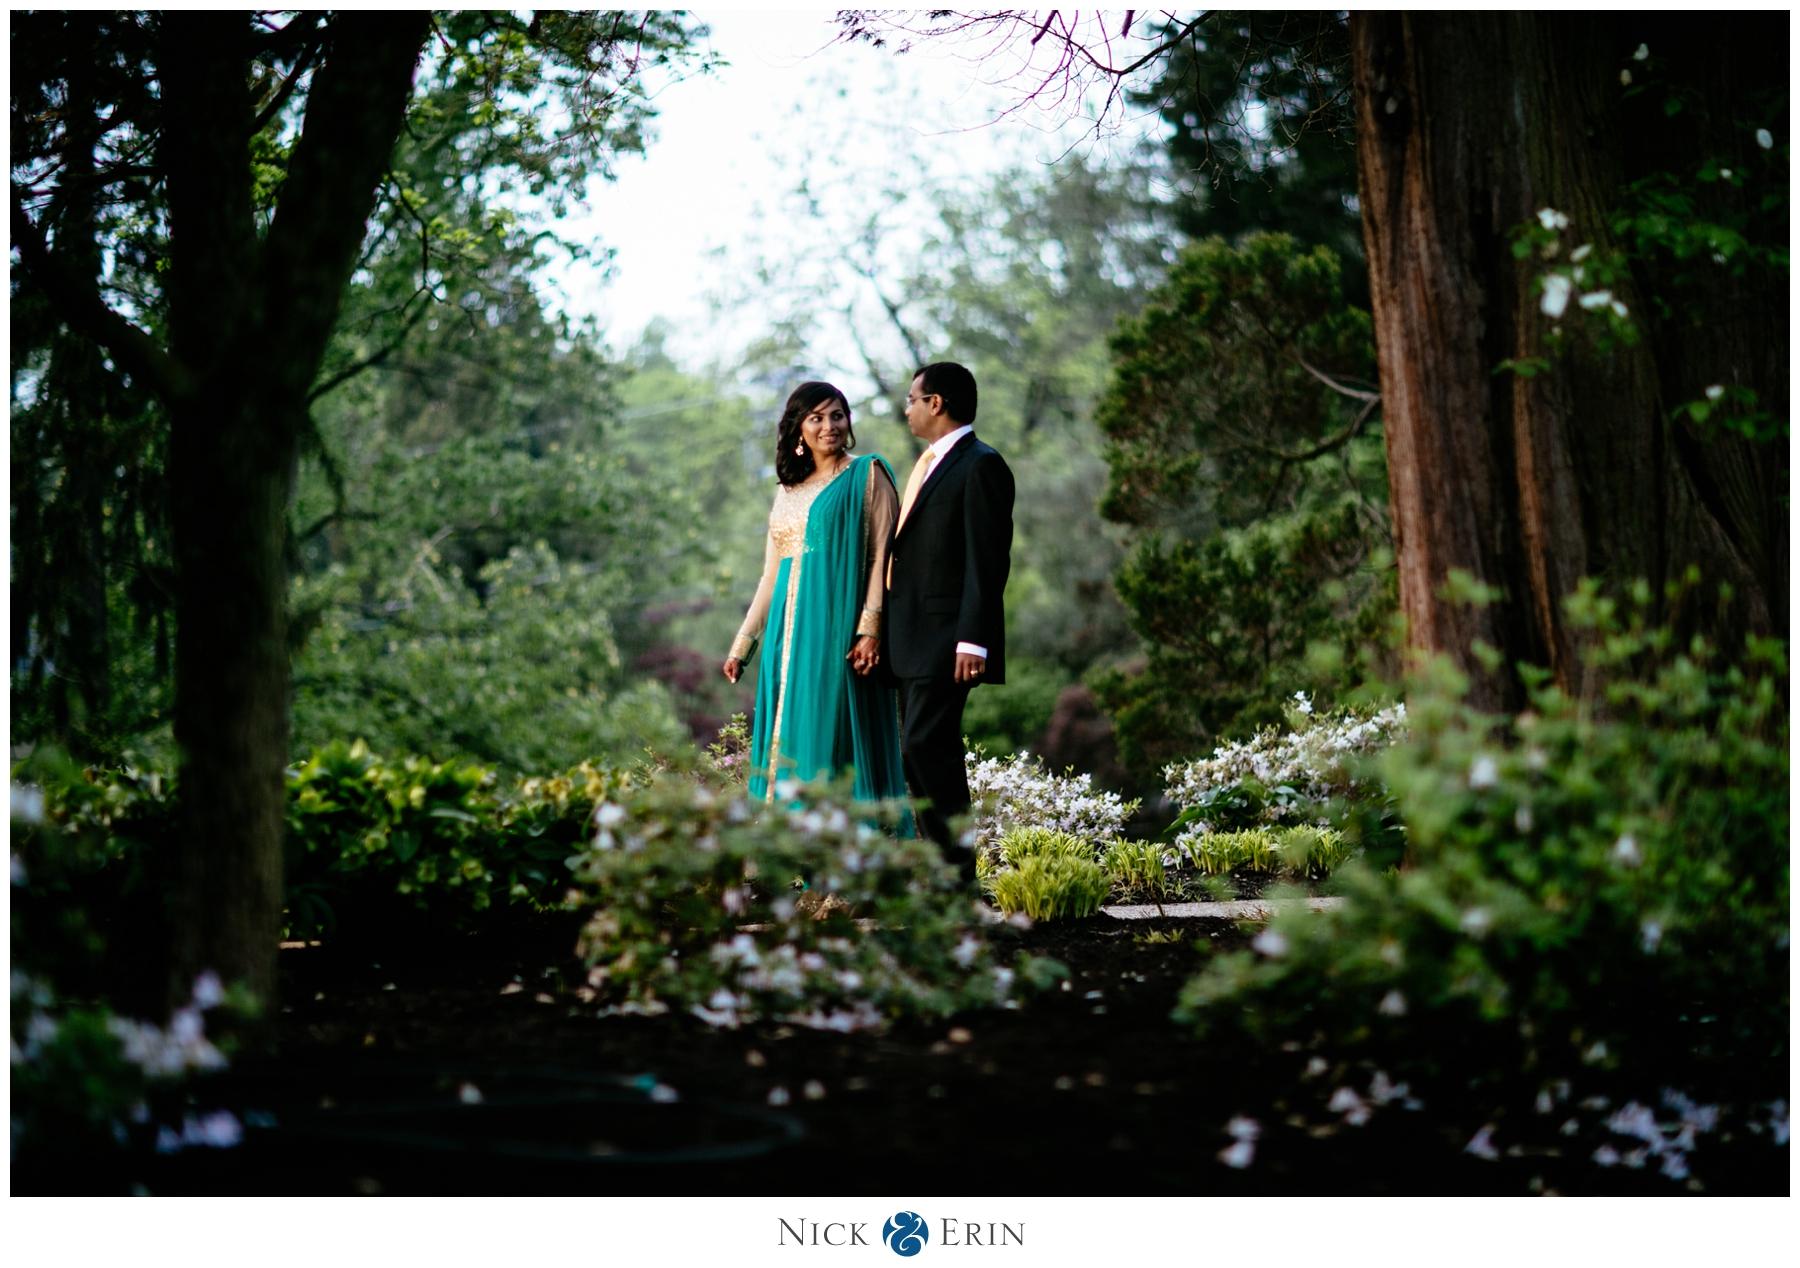 Donner_Photography_Arlington VA Wedding_Amrith and Aleefia_0009